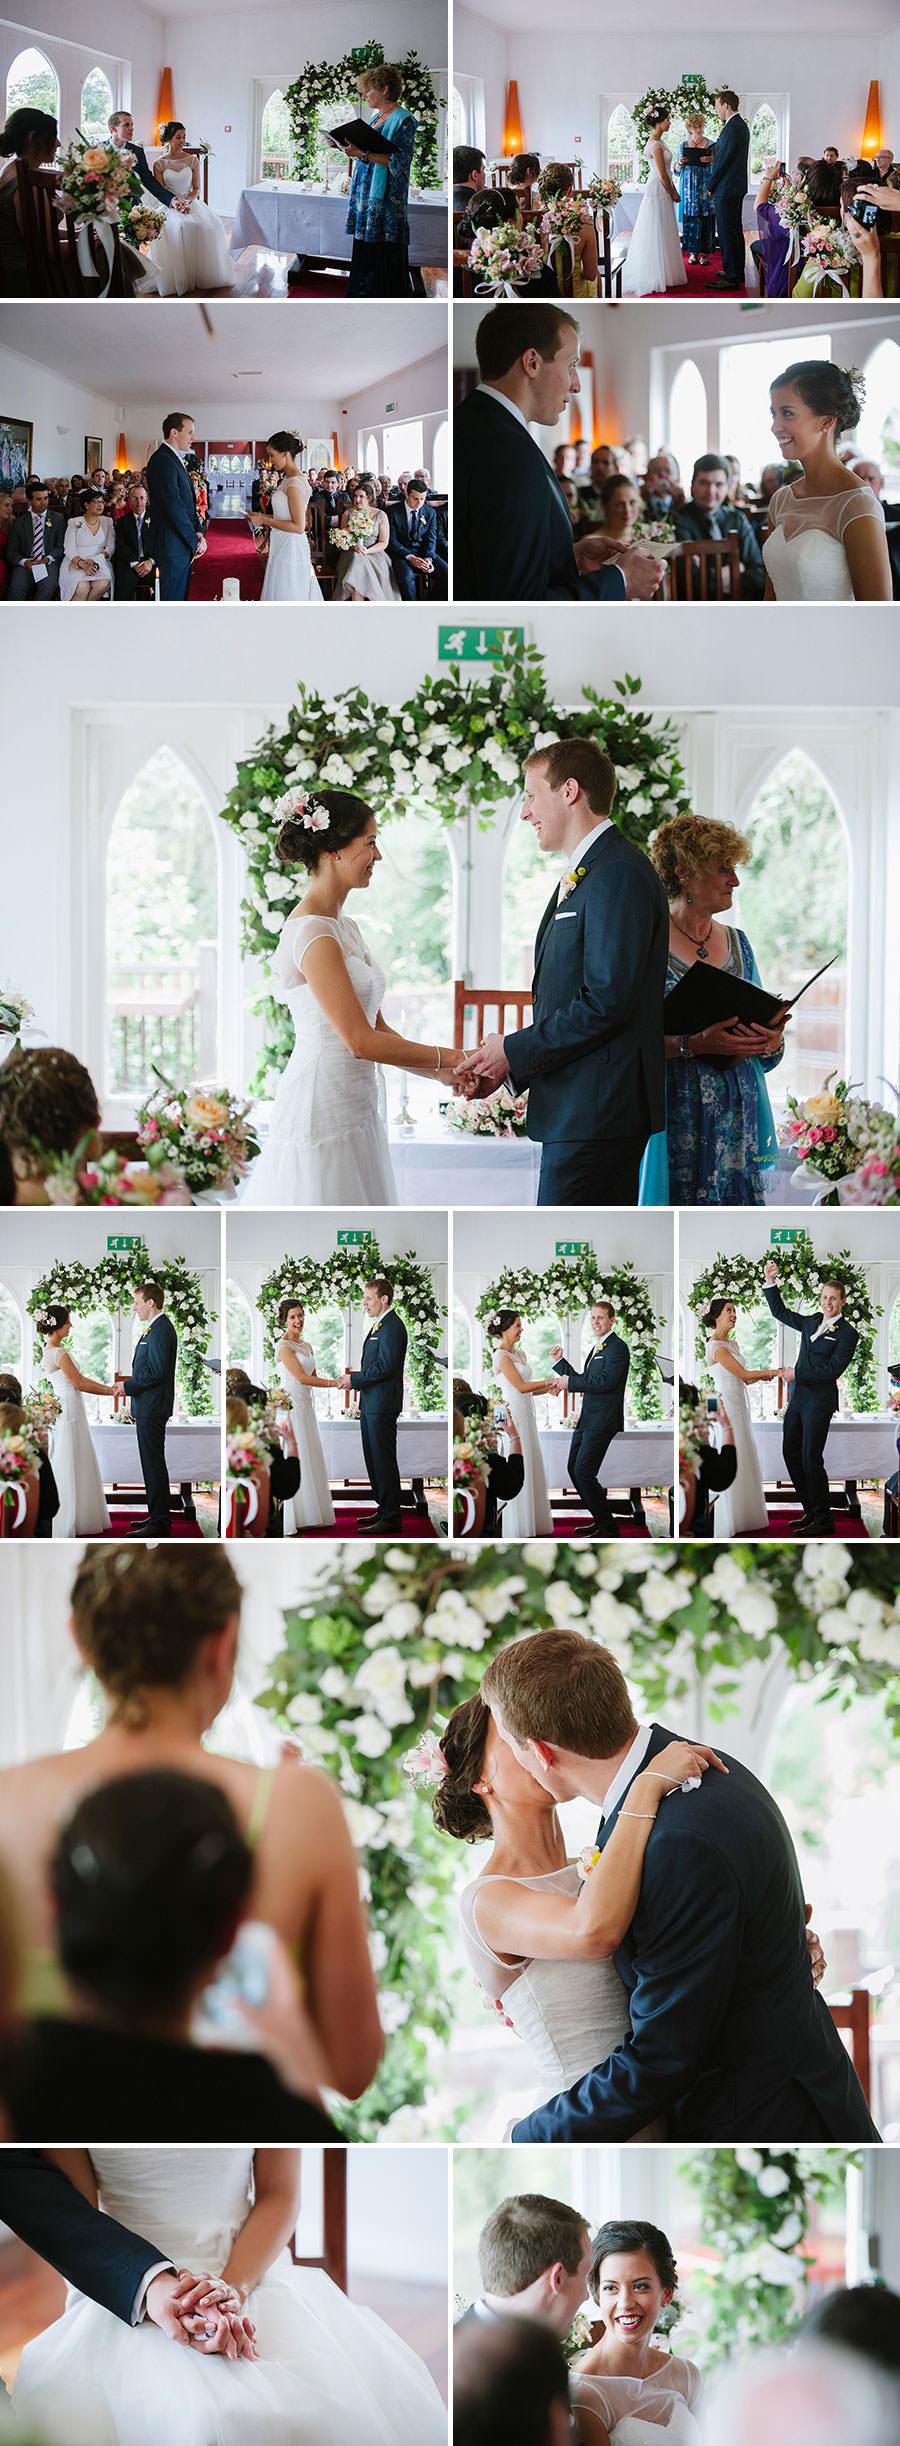 P + R | Barnabrow Country House Wedding | Irish - Australian Wedding | Cork Wedding Photography 8